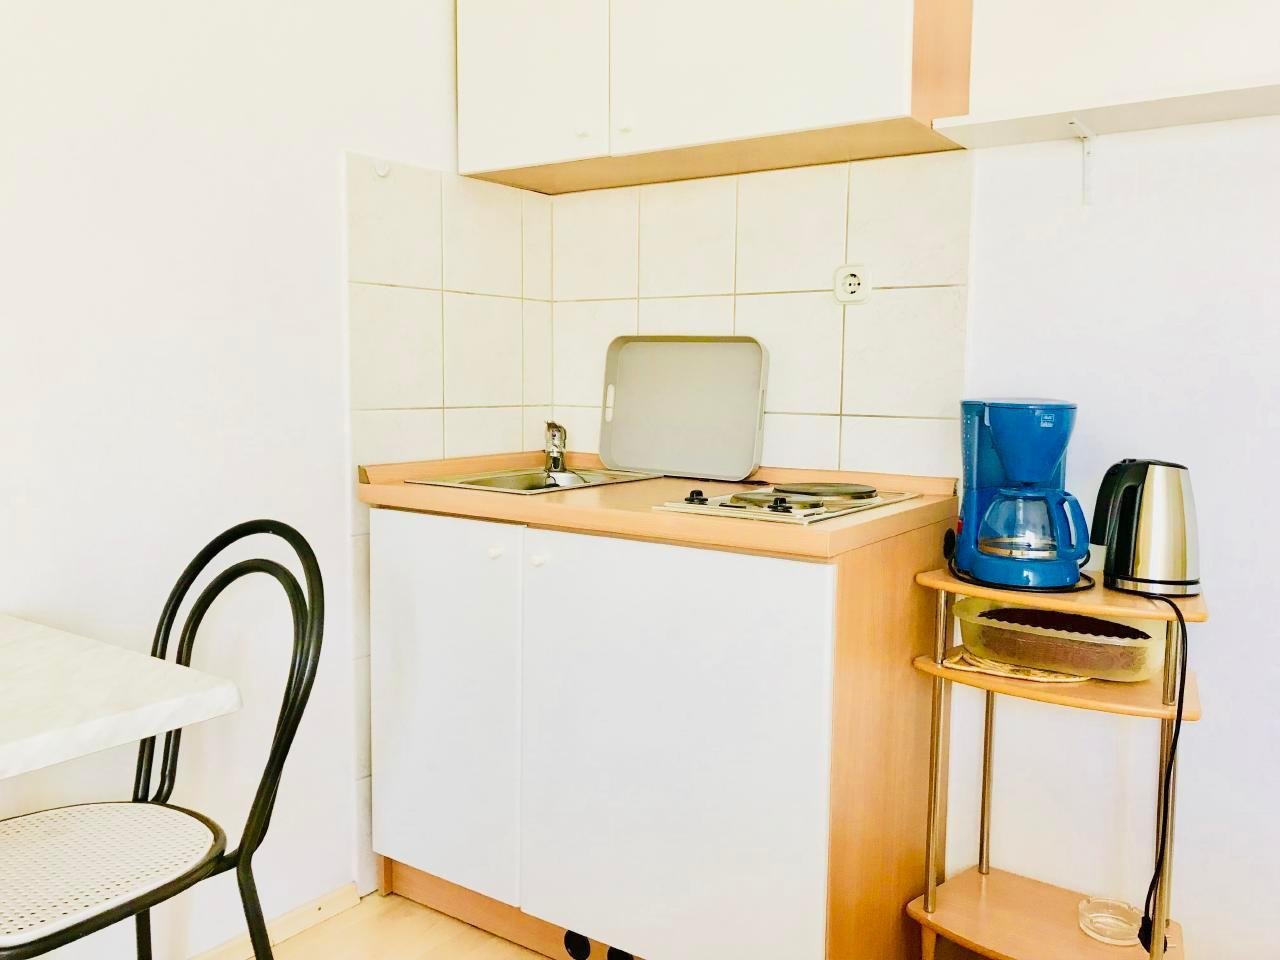 Ferienwohnung Apartmenthaus Ruza 3 - Studio (98391), Kaštel Štafilić, , Dalmatien, Kroatien, Bild 3